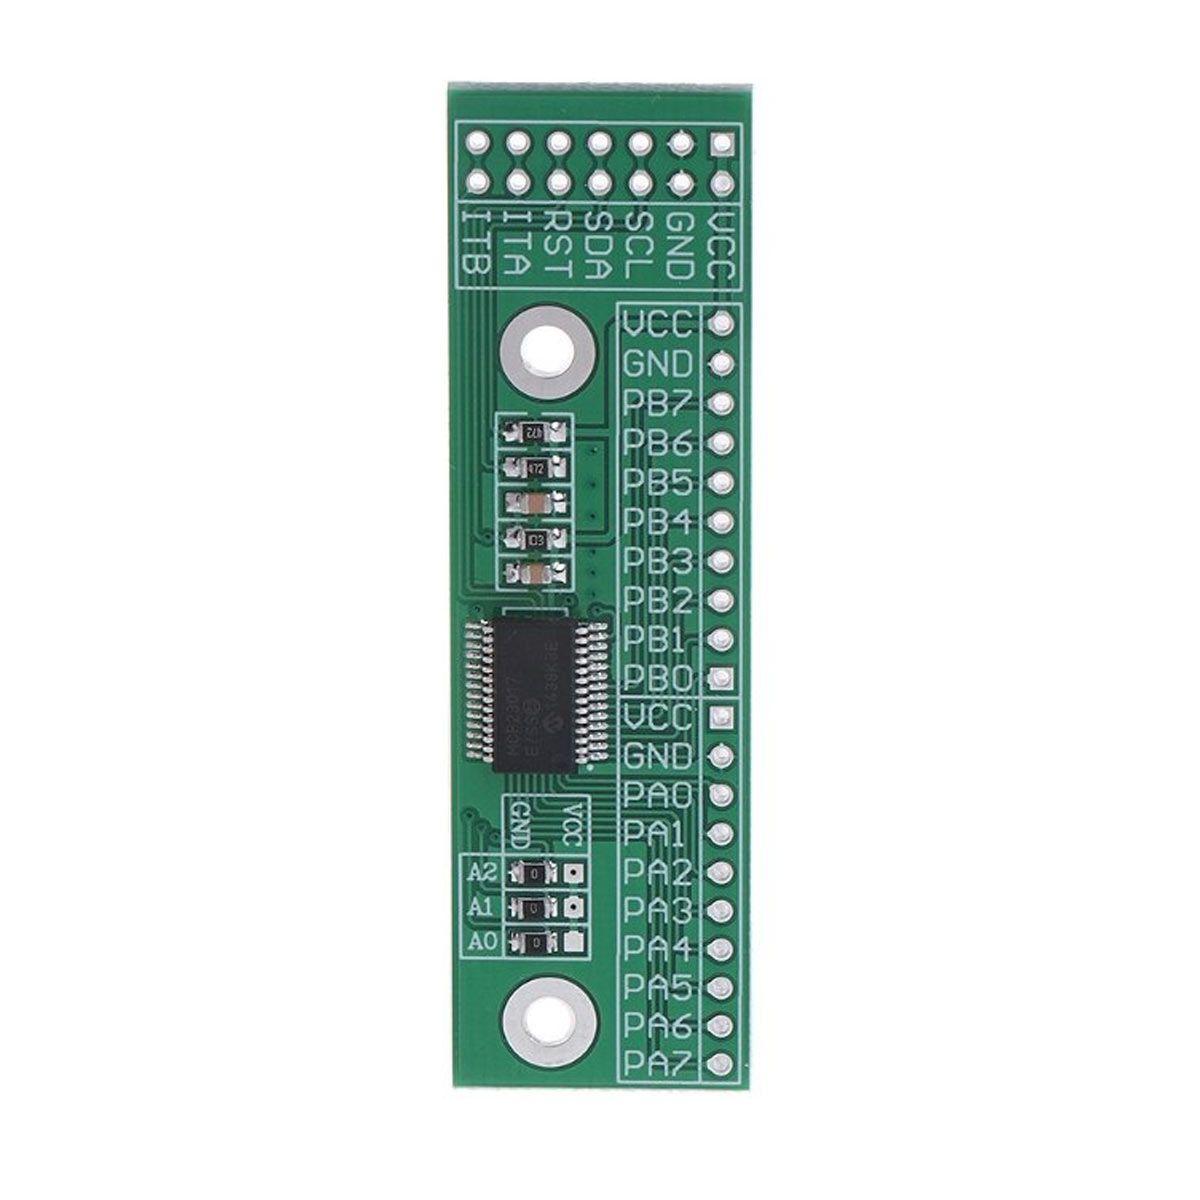 2x Módulo Expansor de Portas de Entrada / Saída Digital 16 Bits Interface I2c - MCP23017